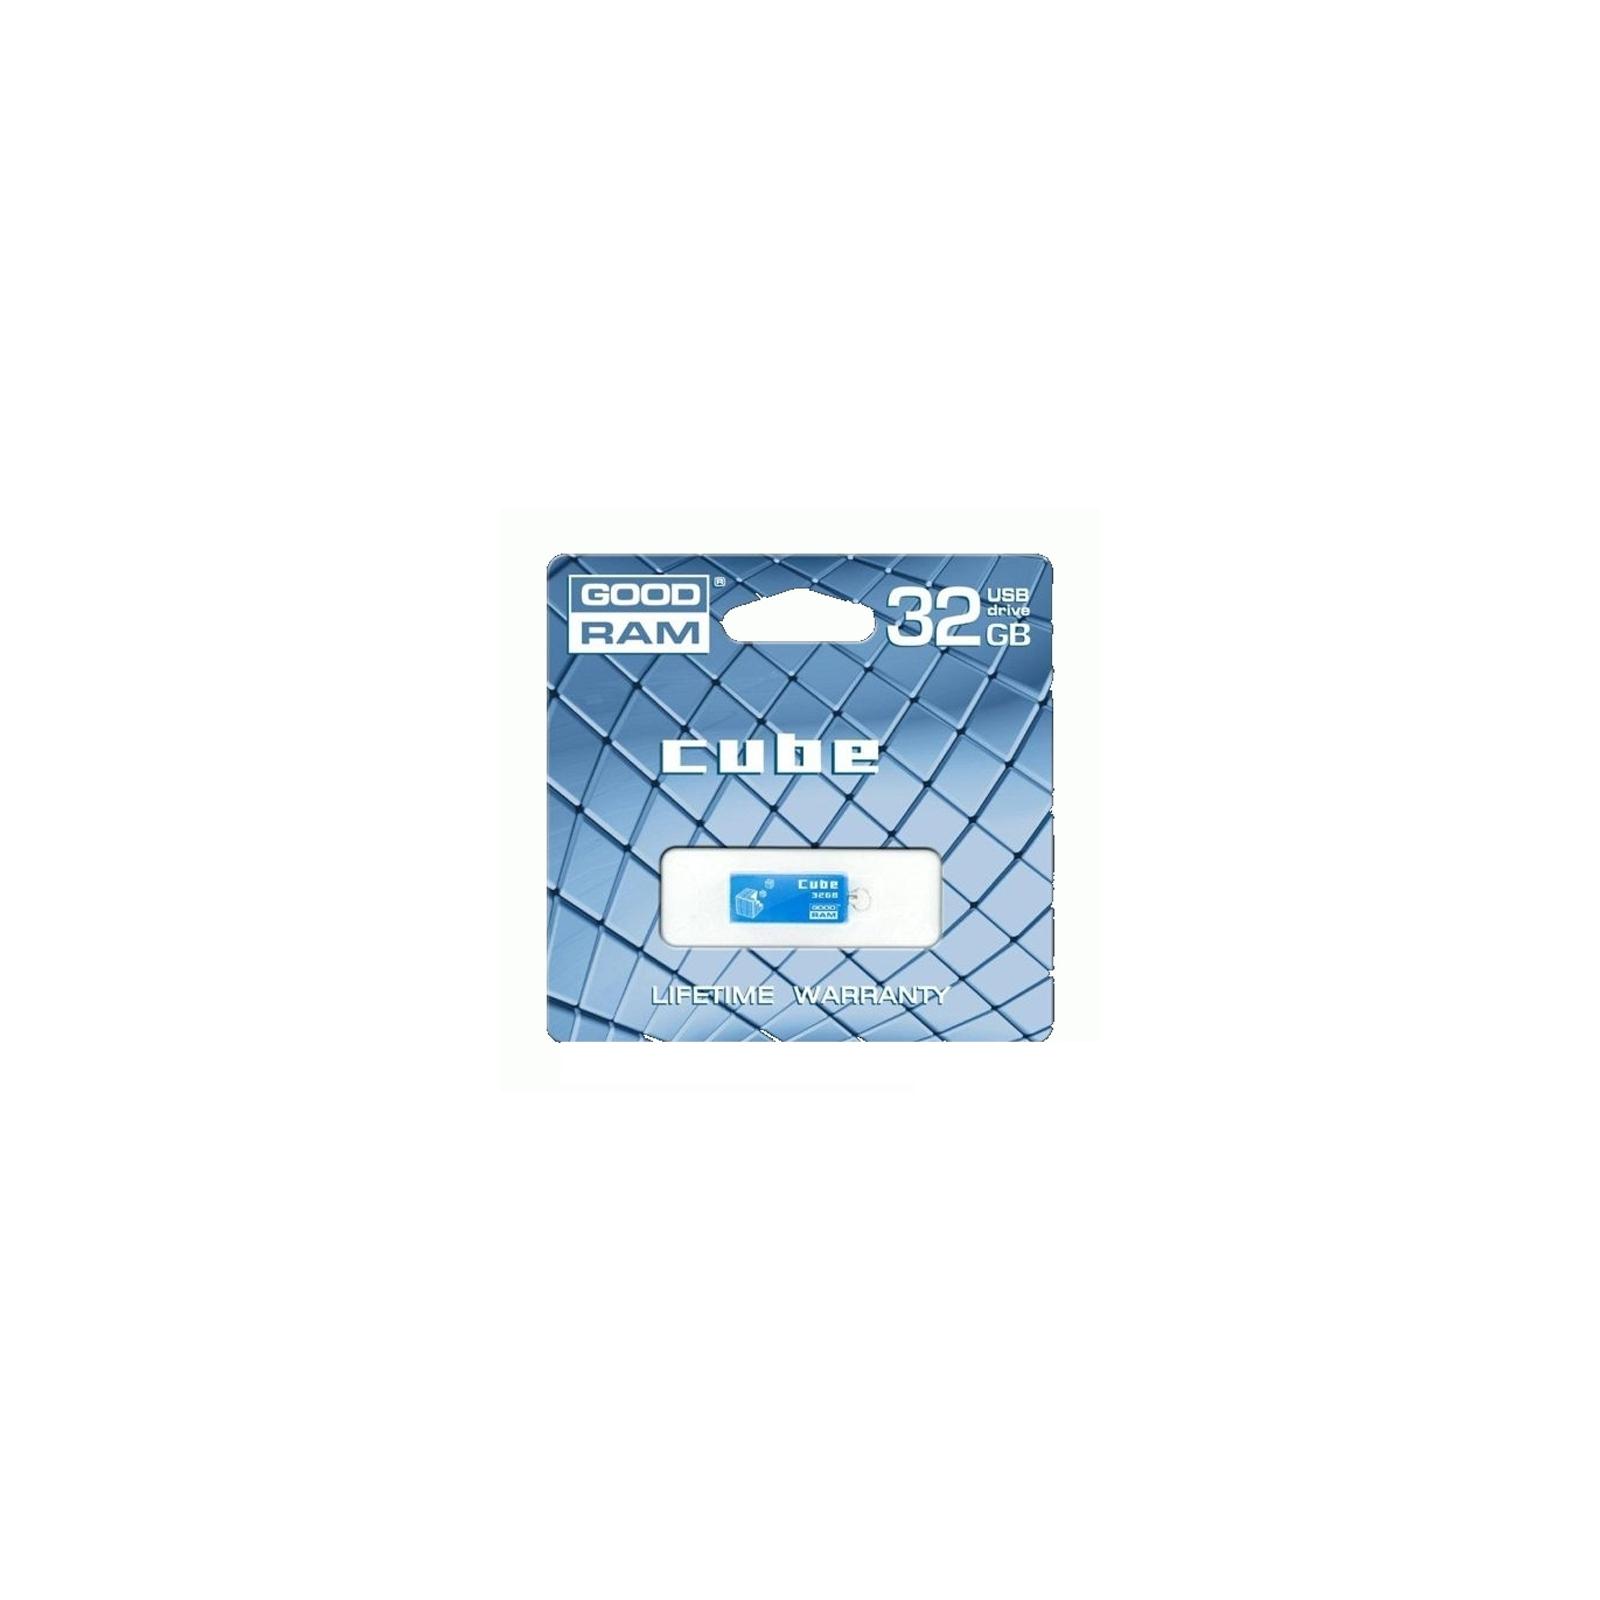 USB флеш накопитель Goodram 32GB Cube Silver USB 2.0 (PD32GH2GRCUSR9) изображение 4